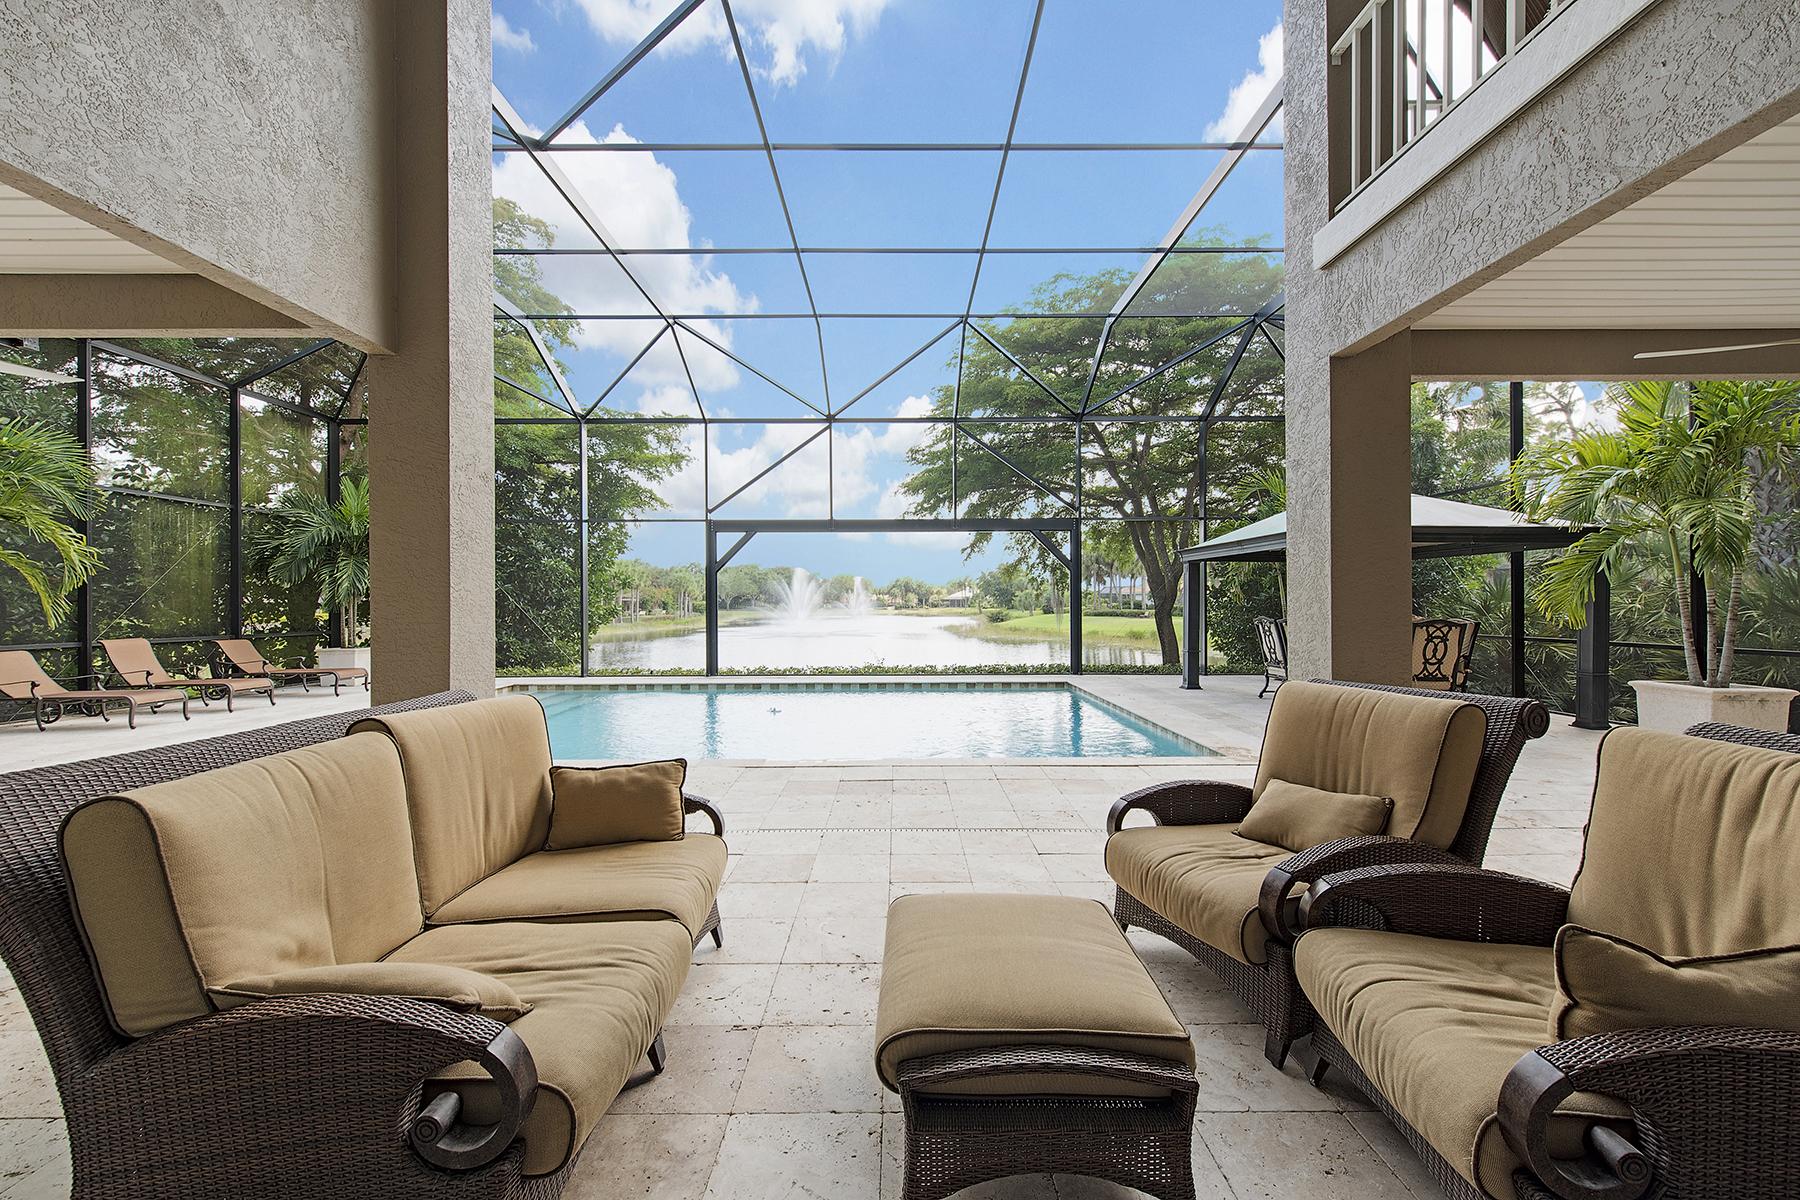 Single Family Home for Sale at PELICAN LANDING - LONGLAKE 24560 Woodsage Dr, Bonita Springs, Florida 34134 United States